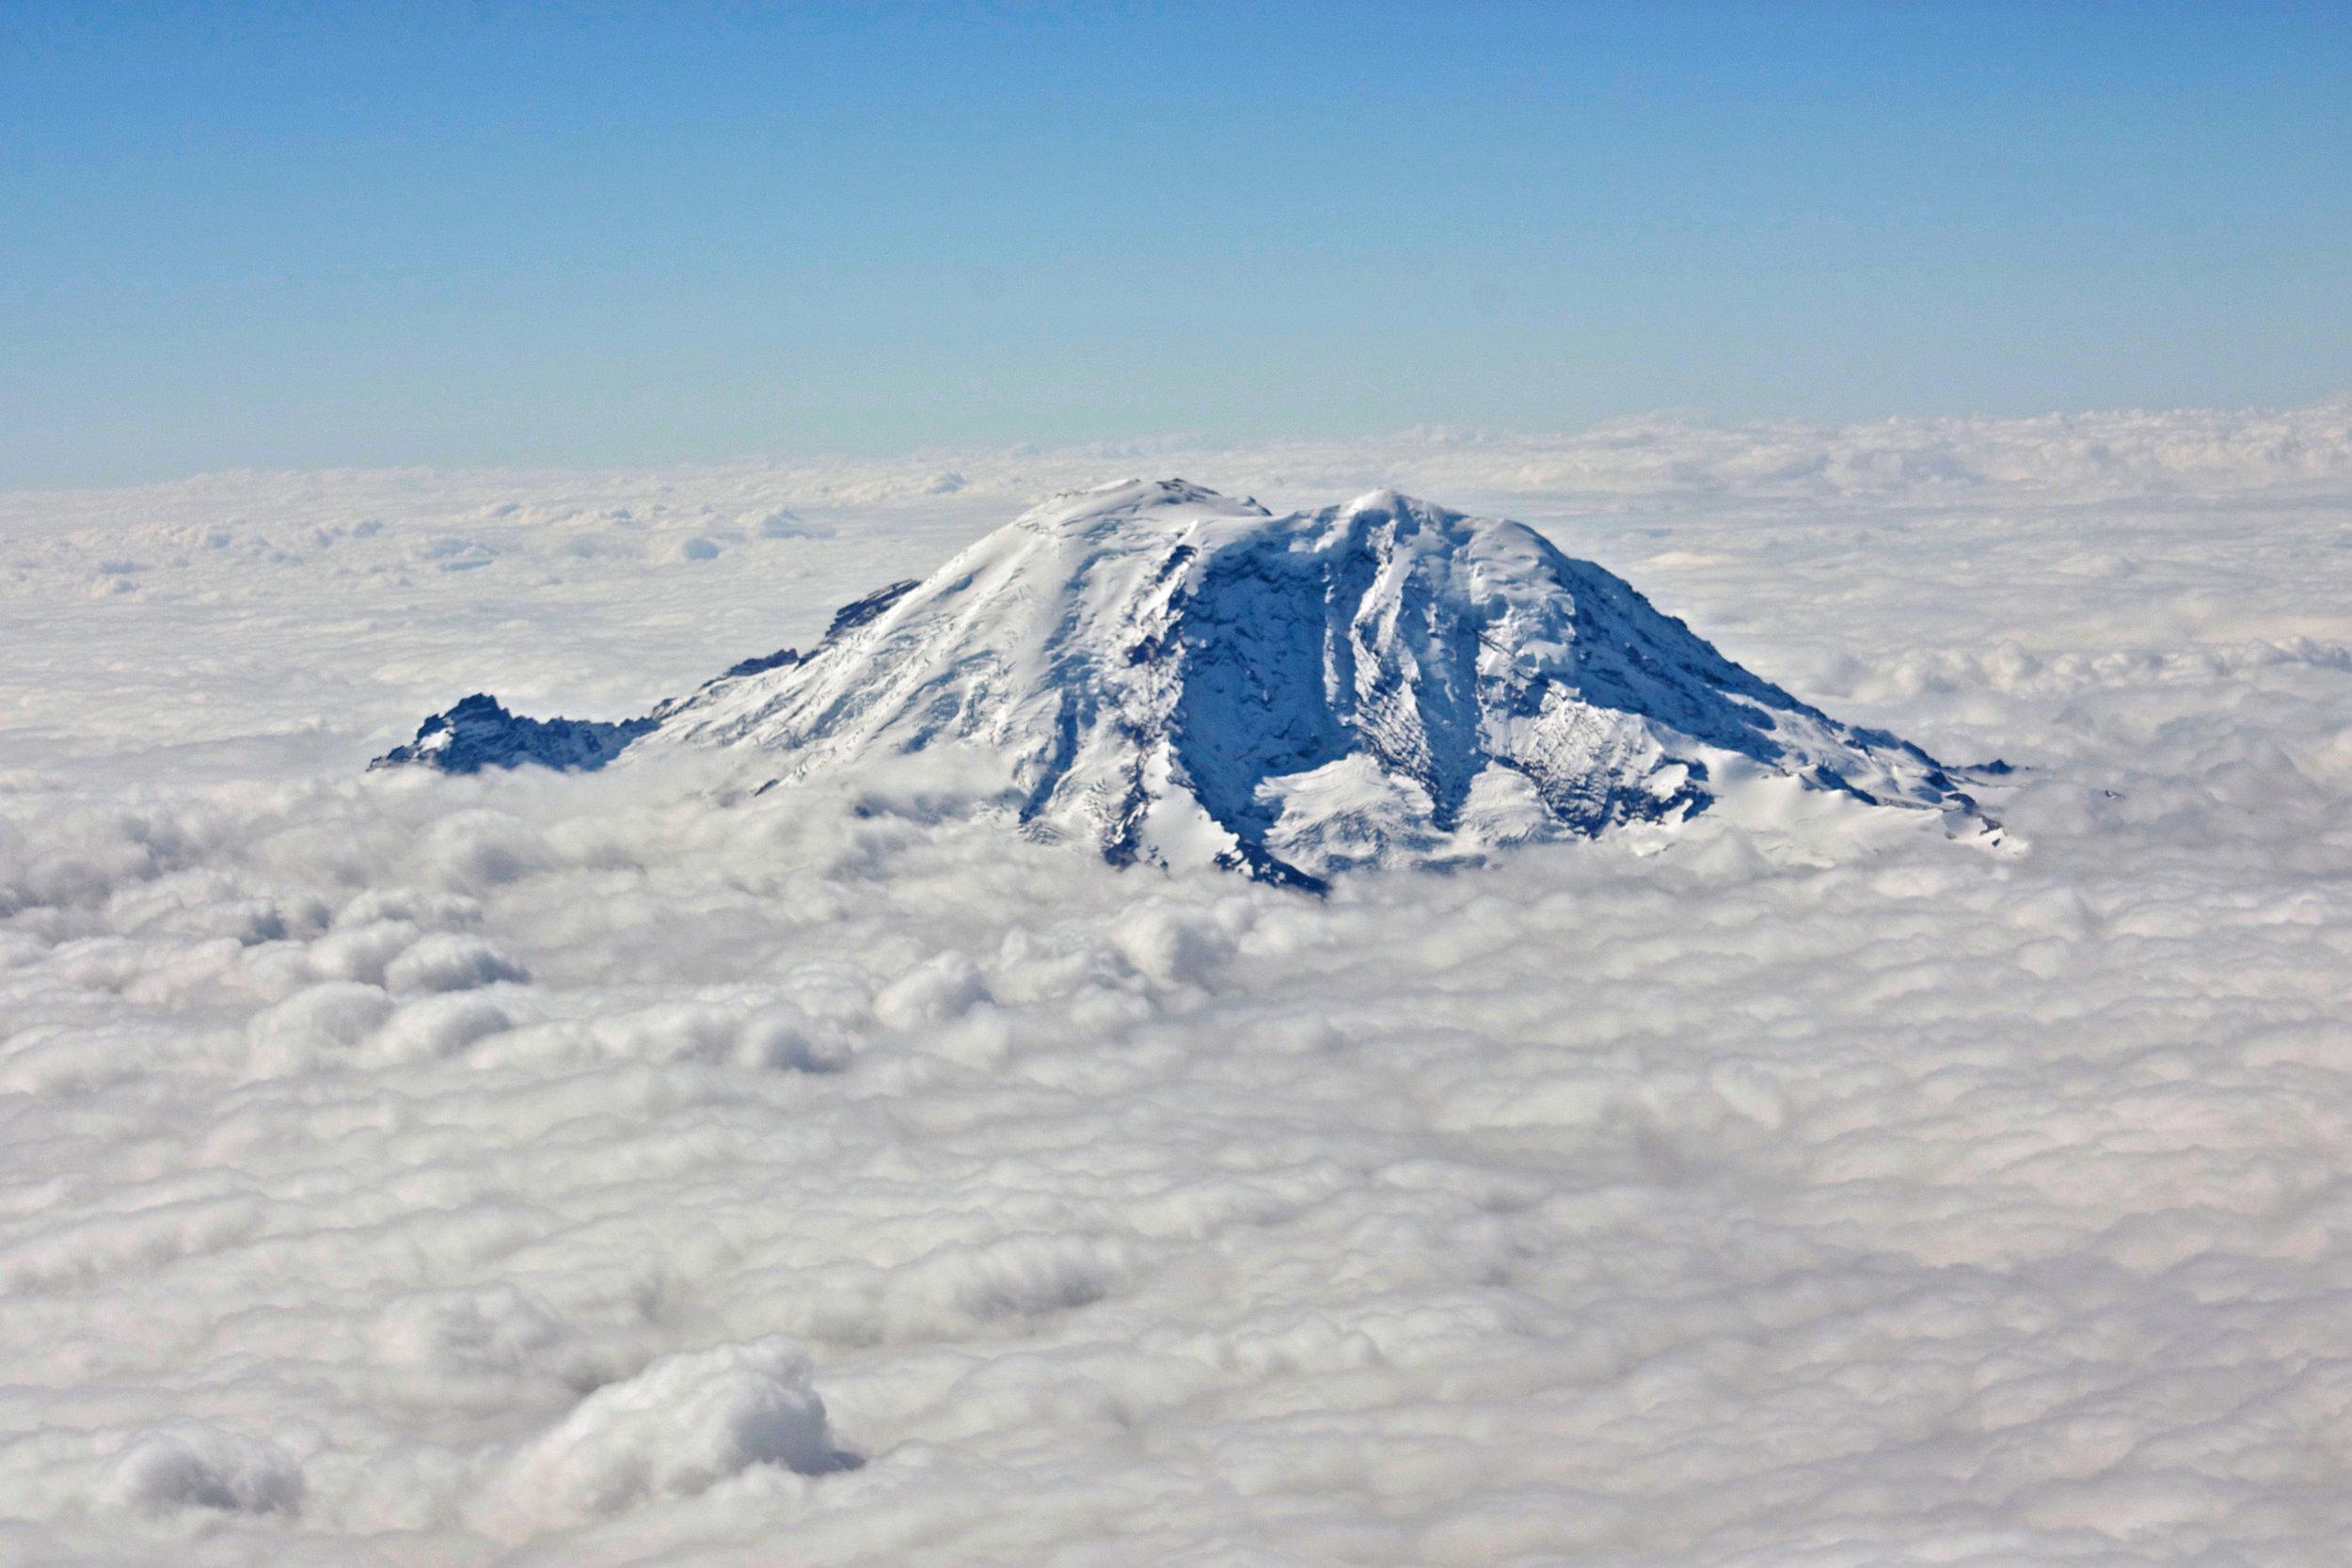 Mt. Rainier from 20,000 feet